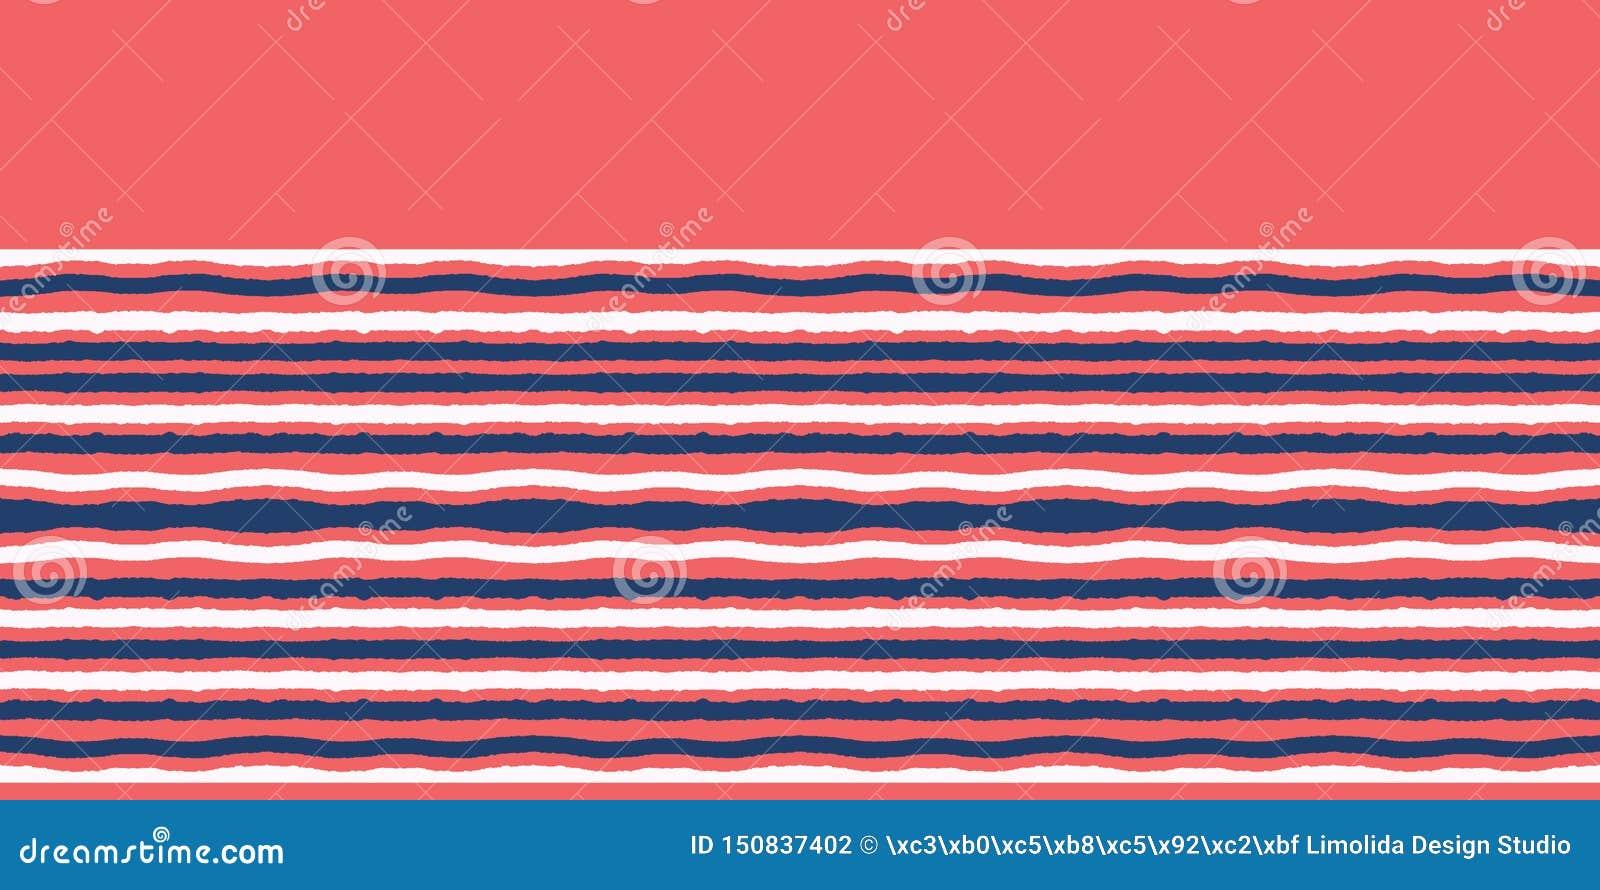 Red blue ocean regatta stripes seamless vector border pattern. Hand drawn seaside banner edging. Aqua nautical textiles, maritime